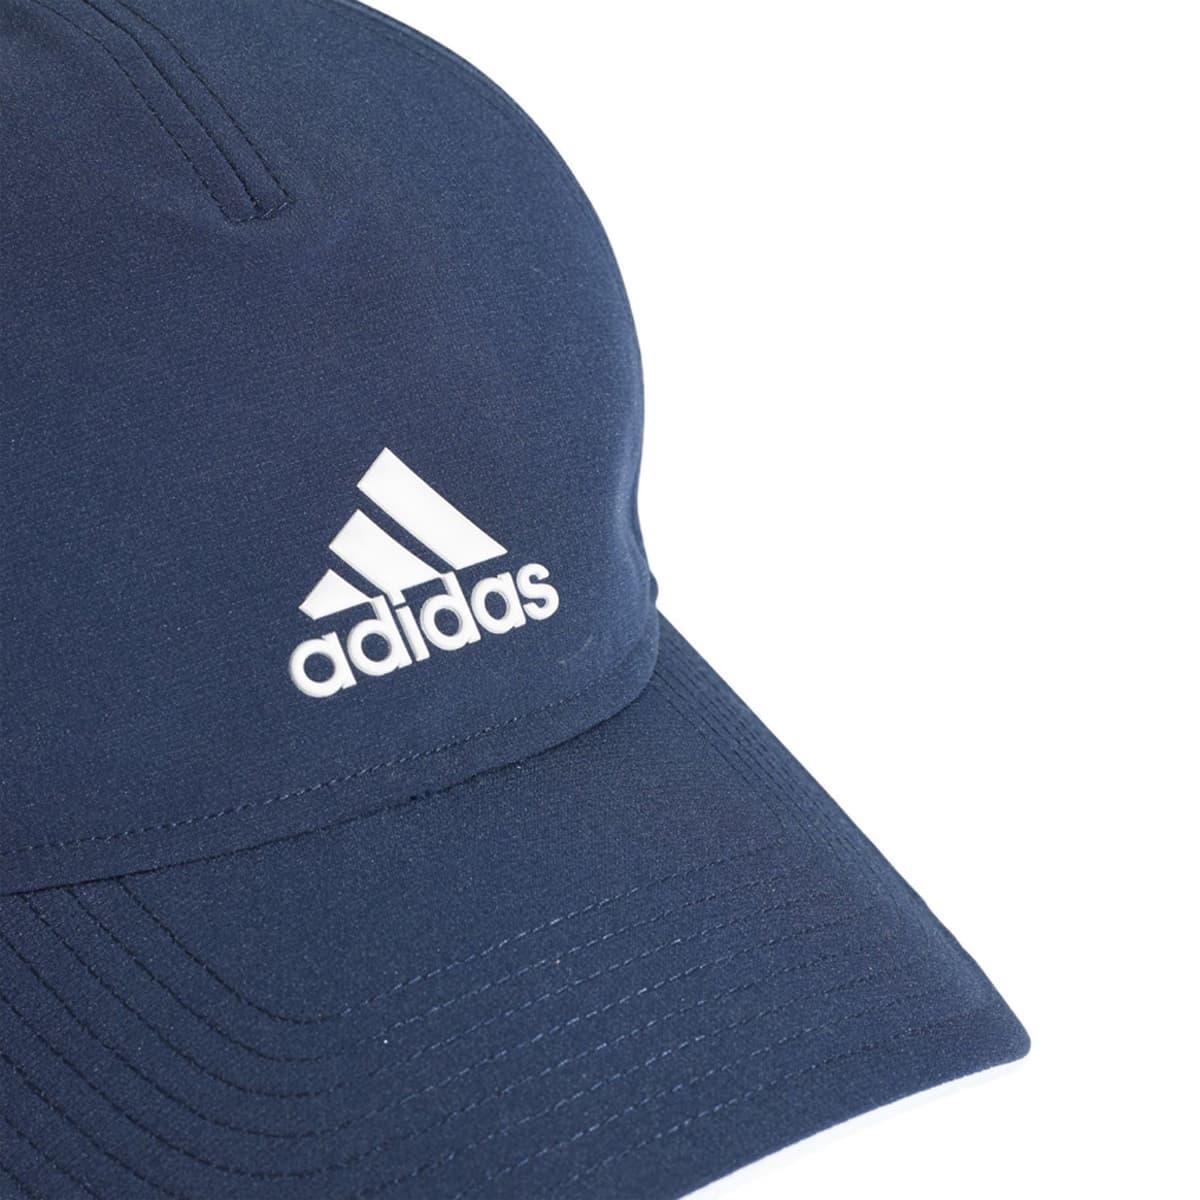 C40 Climalite Mavi Unisex Spor Şapka